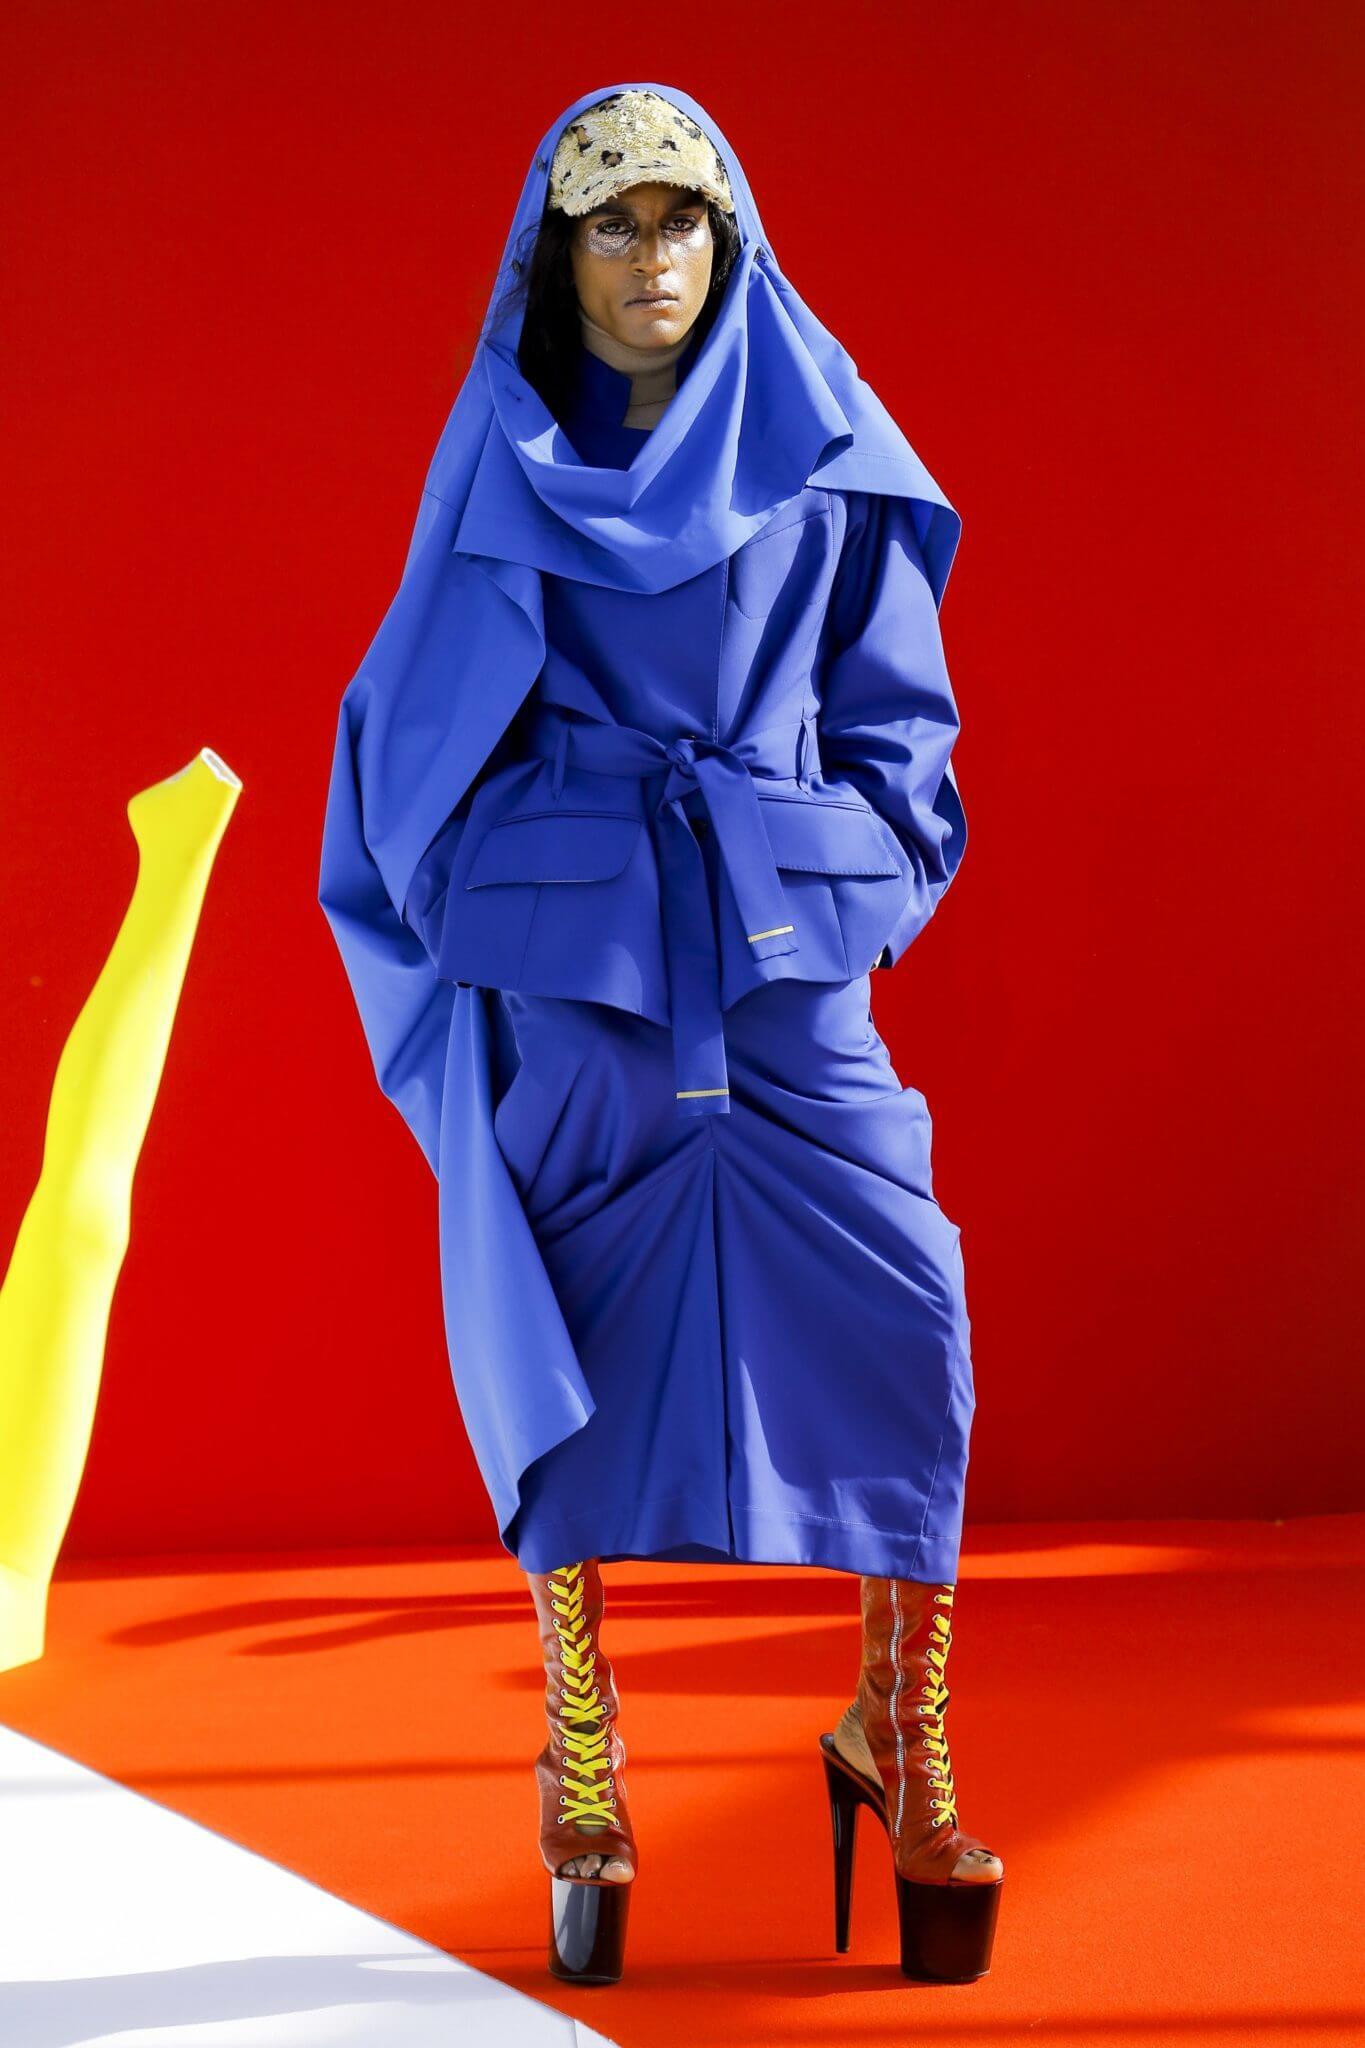 Andreas Kronthaler x Vivienne Westwood Aw 2018 / Paris Fashion Week. Fotografía: Luca Tombolini